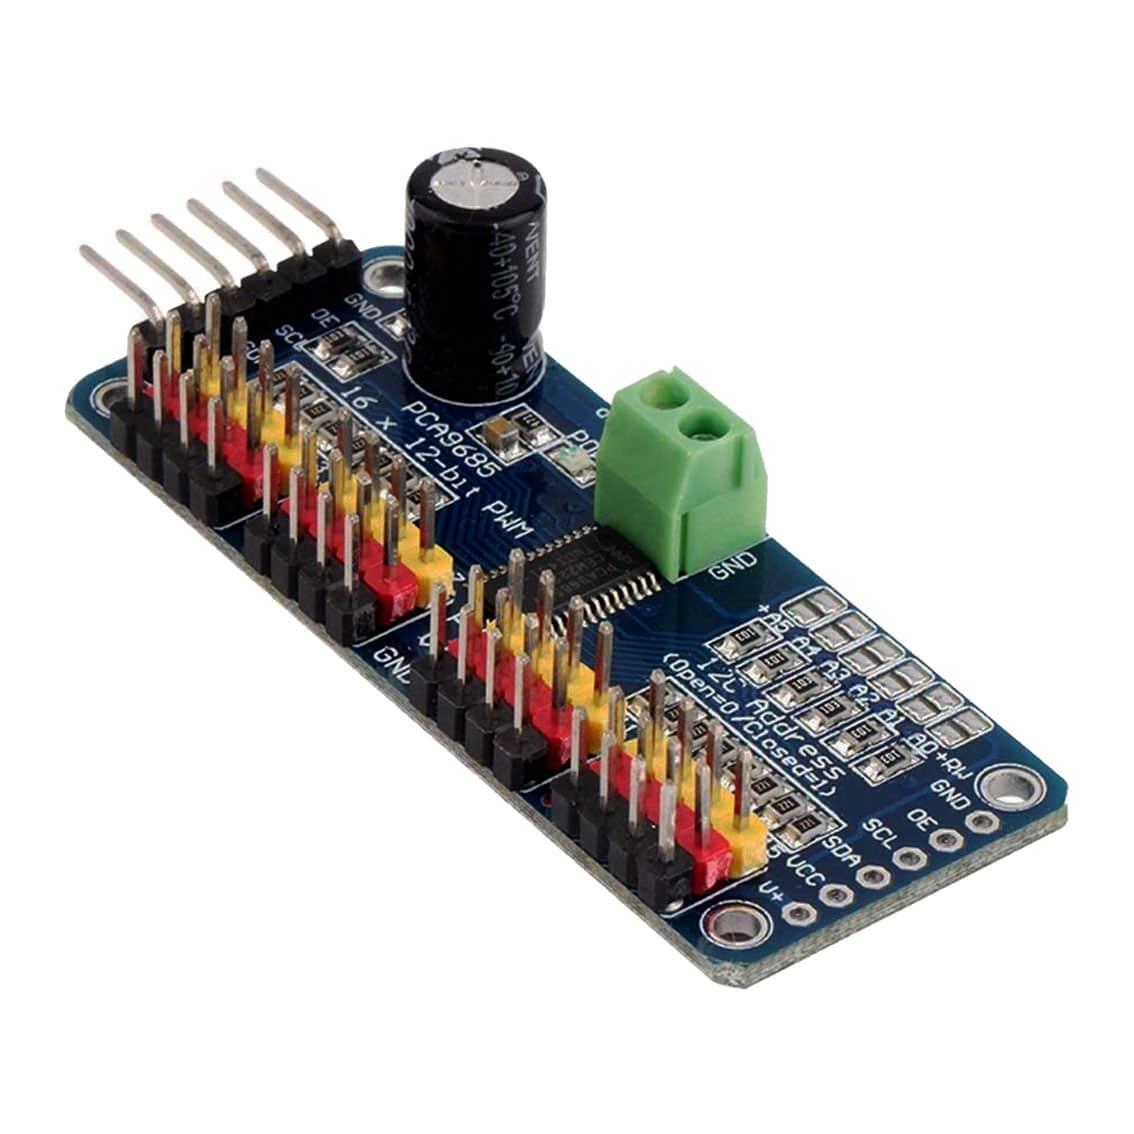 16-Channel 12-bit PWM Servo Driver with I2C Interface